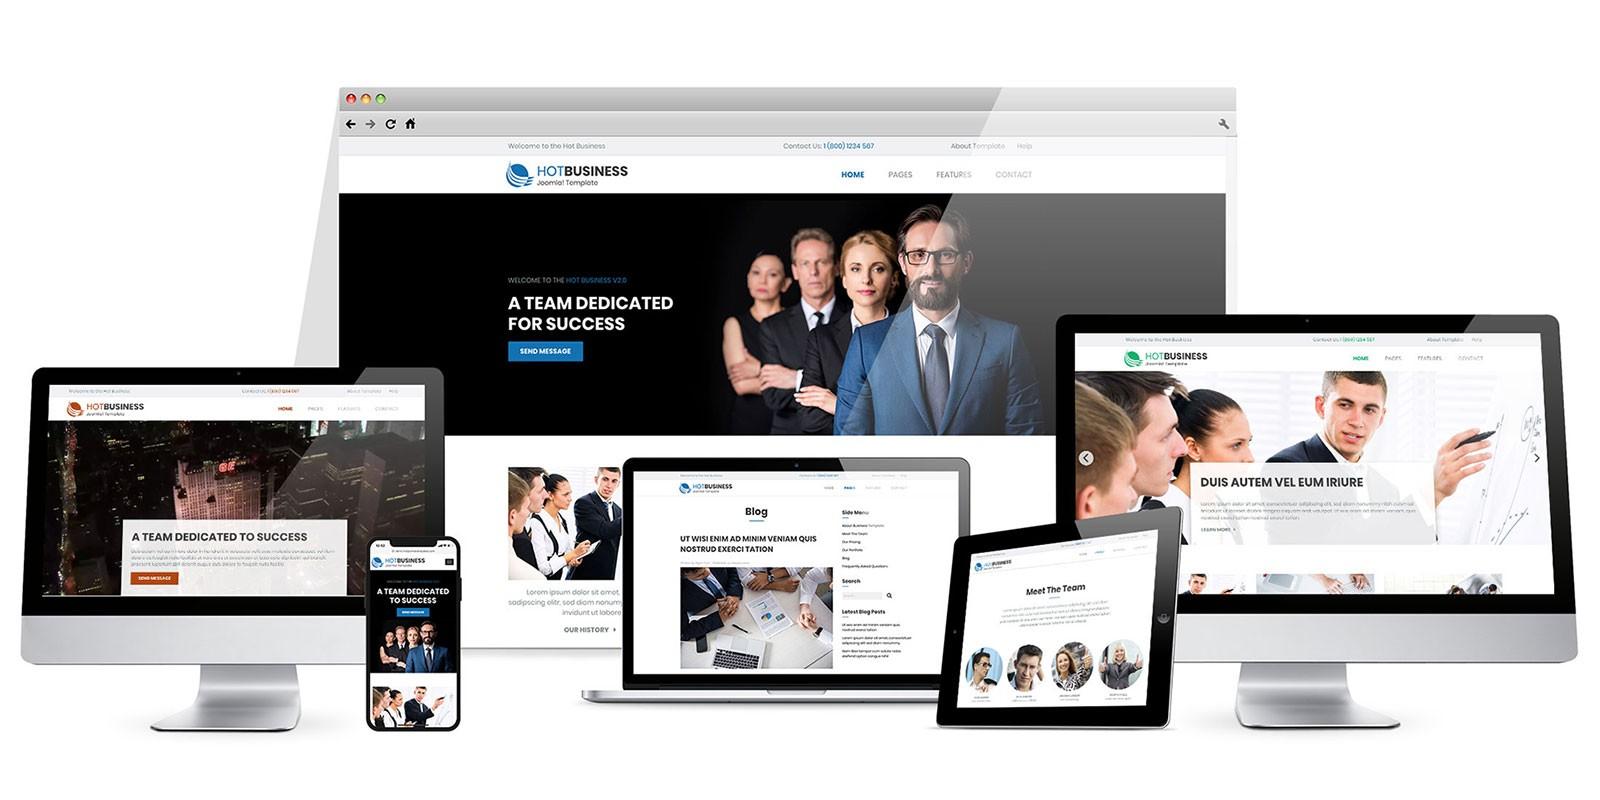 Hot Business - WordPress Gutenberg Theme